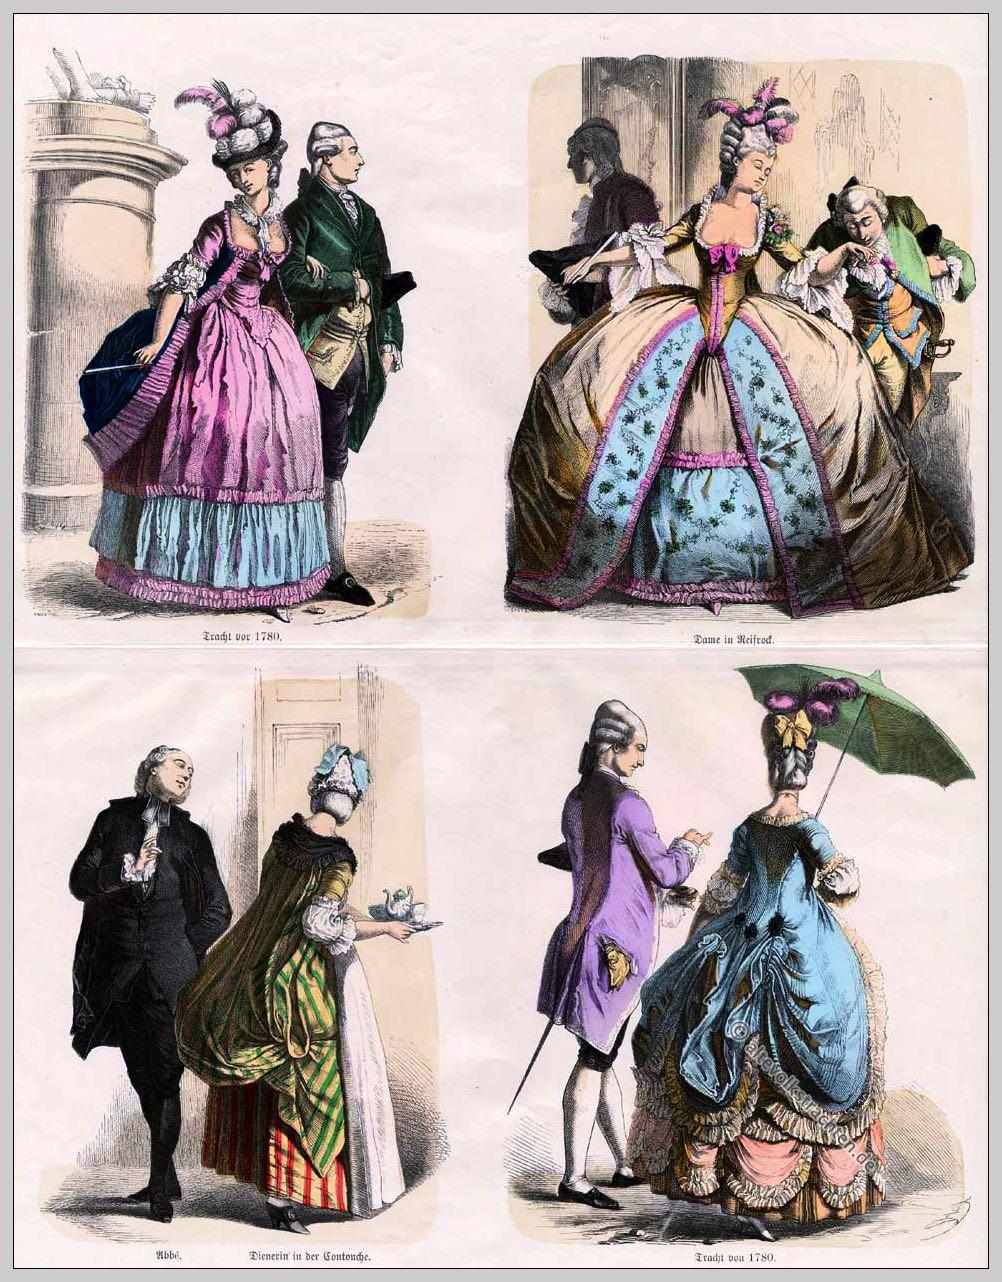 Rokoko, Mode, Dame, Reifrock, Abbé, Tracht, Dienerin, Contouche, Kostüme, Münchener Bilderbogen